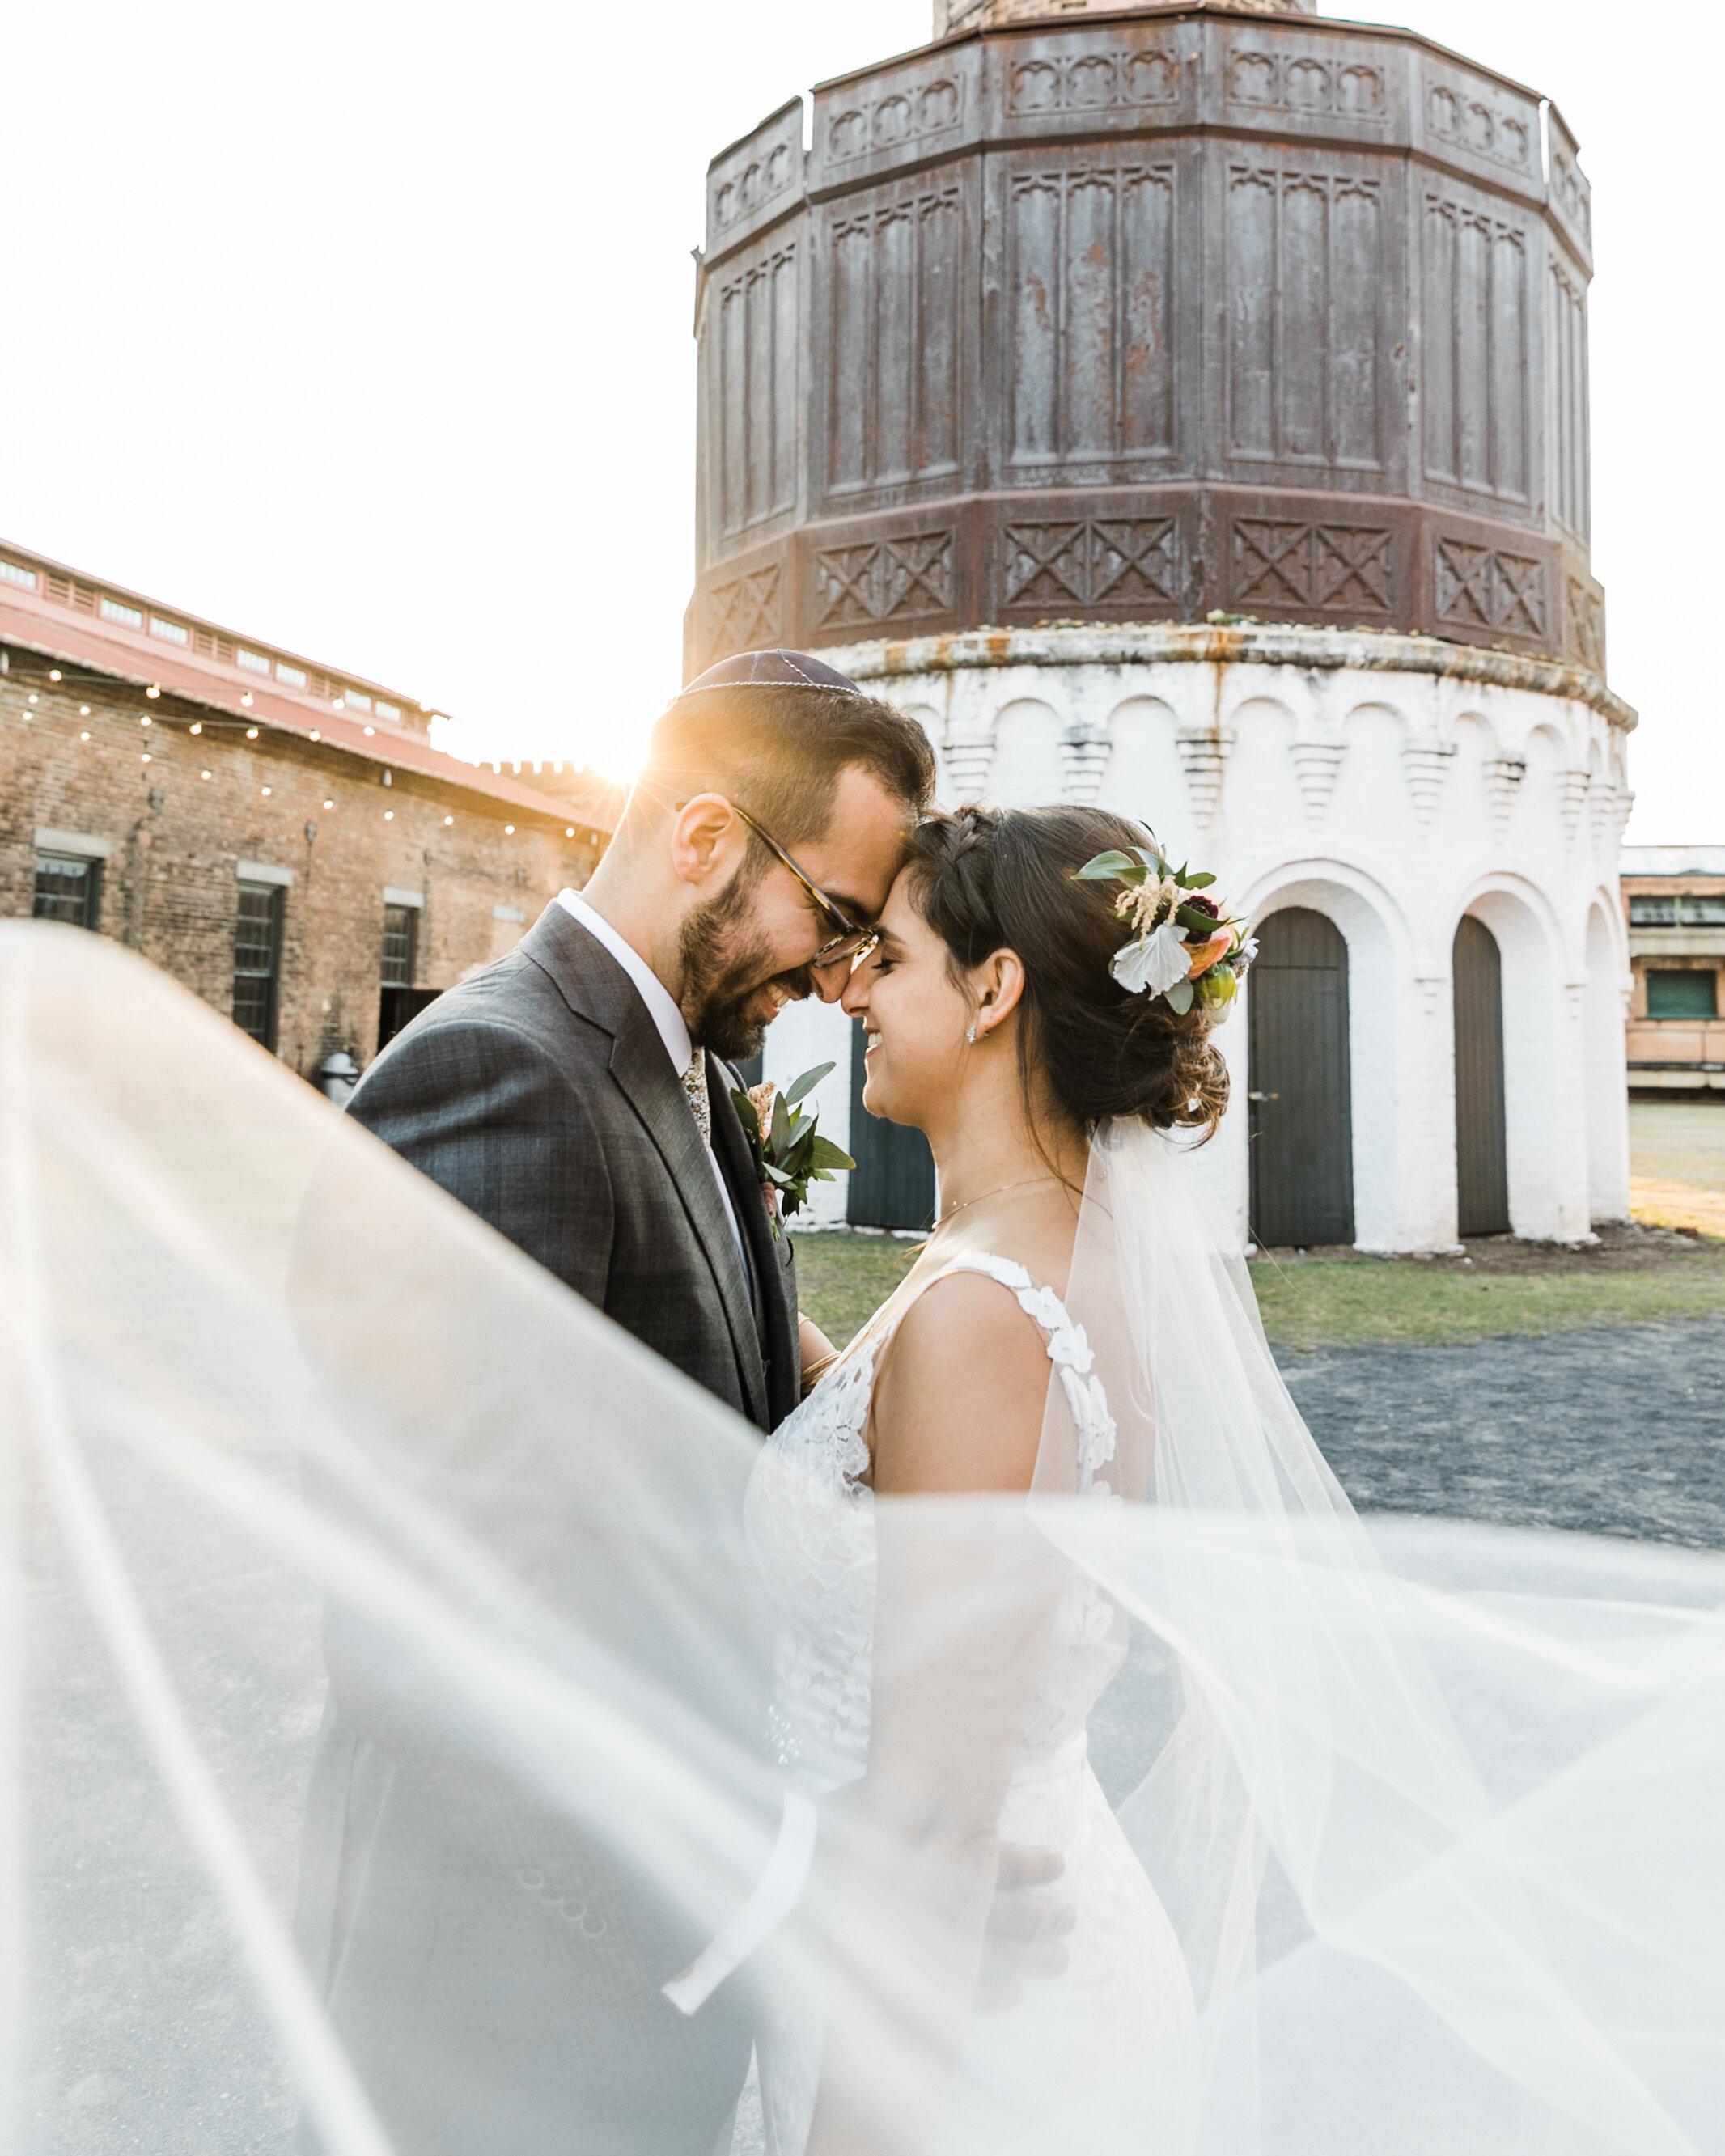 ivory-and-beau-blog-weddings-ivory-and-beau-couple-dominique-and-andres-savannah-florist-wedding-planning-savannah-bridal-boutique-wedding-flowers-KIP_WEBERWEDDING_RAILROADMUSEUM-1301.JPG